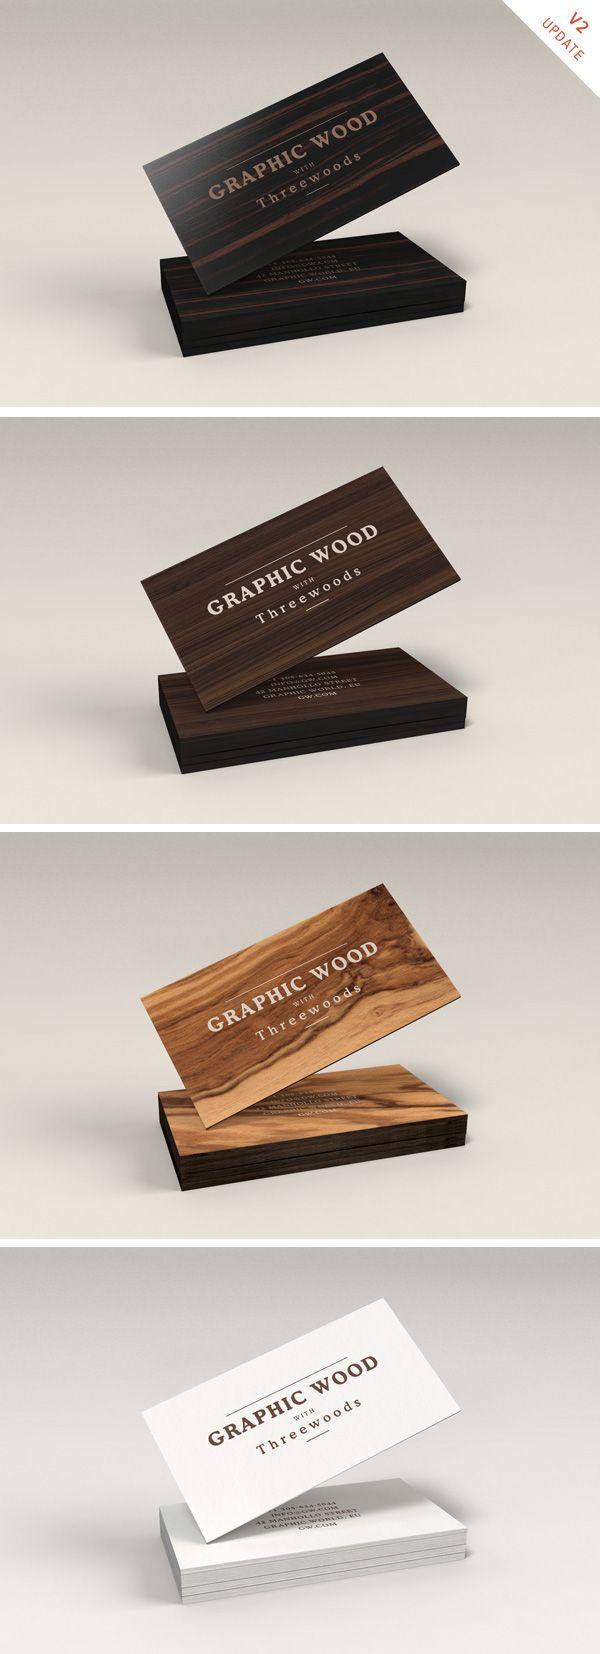 32 High Quality Logo PSD MockUps | Business cards, Graphic designers ...